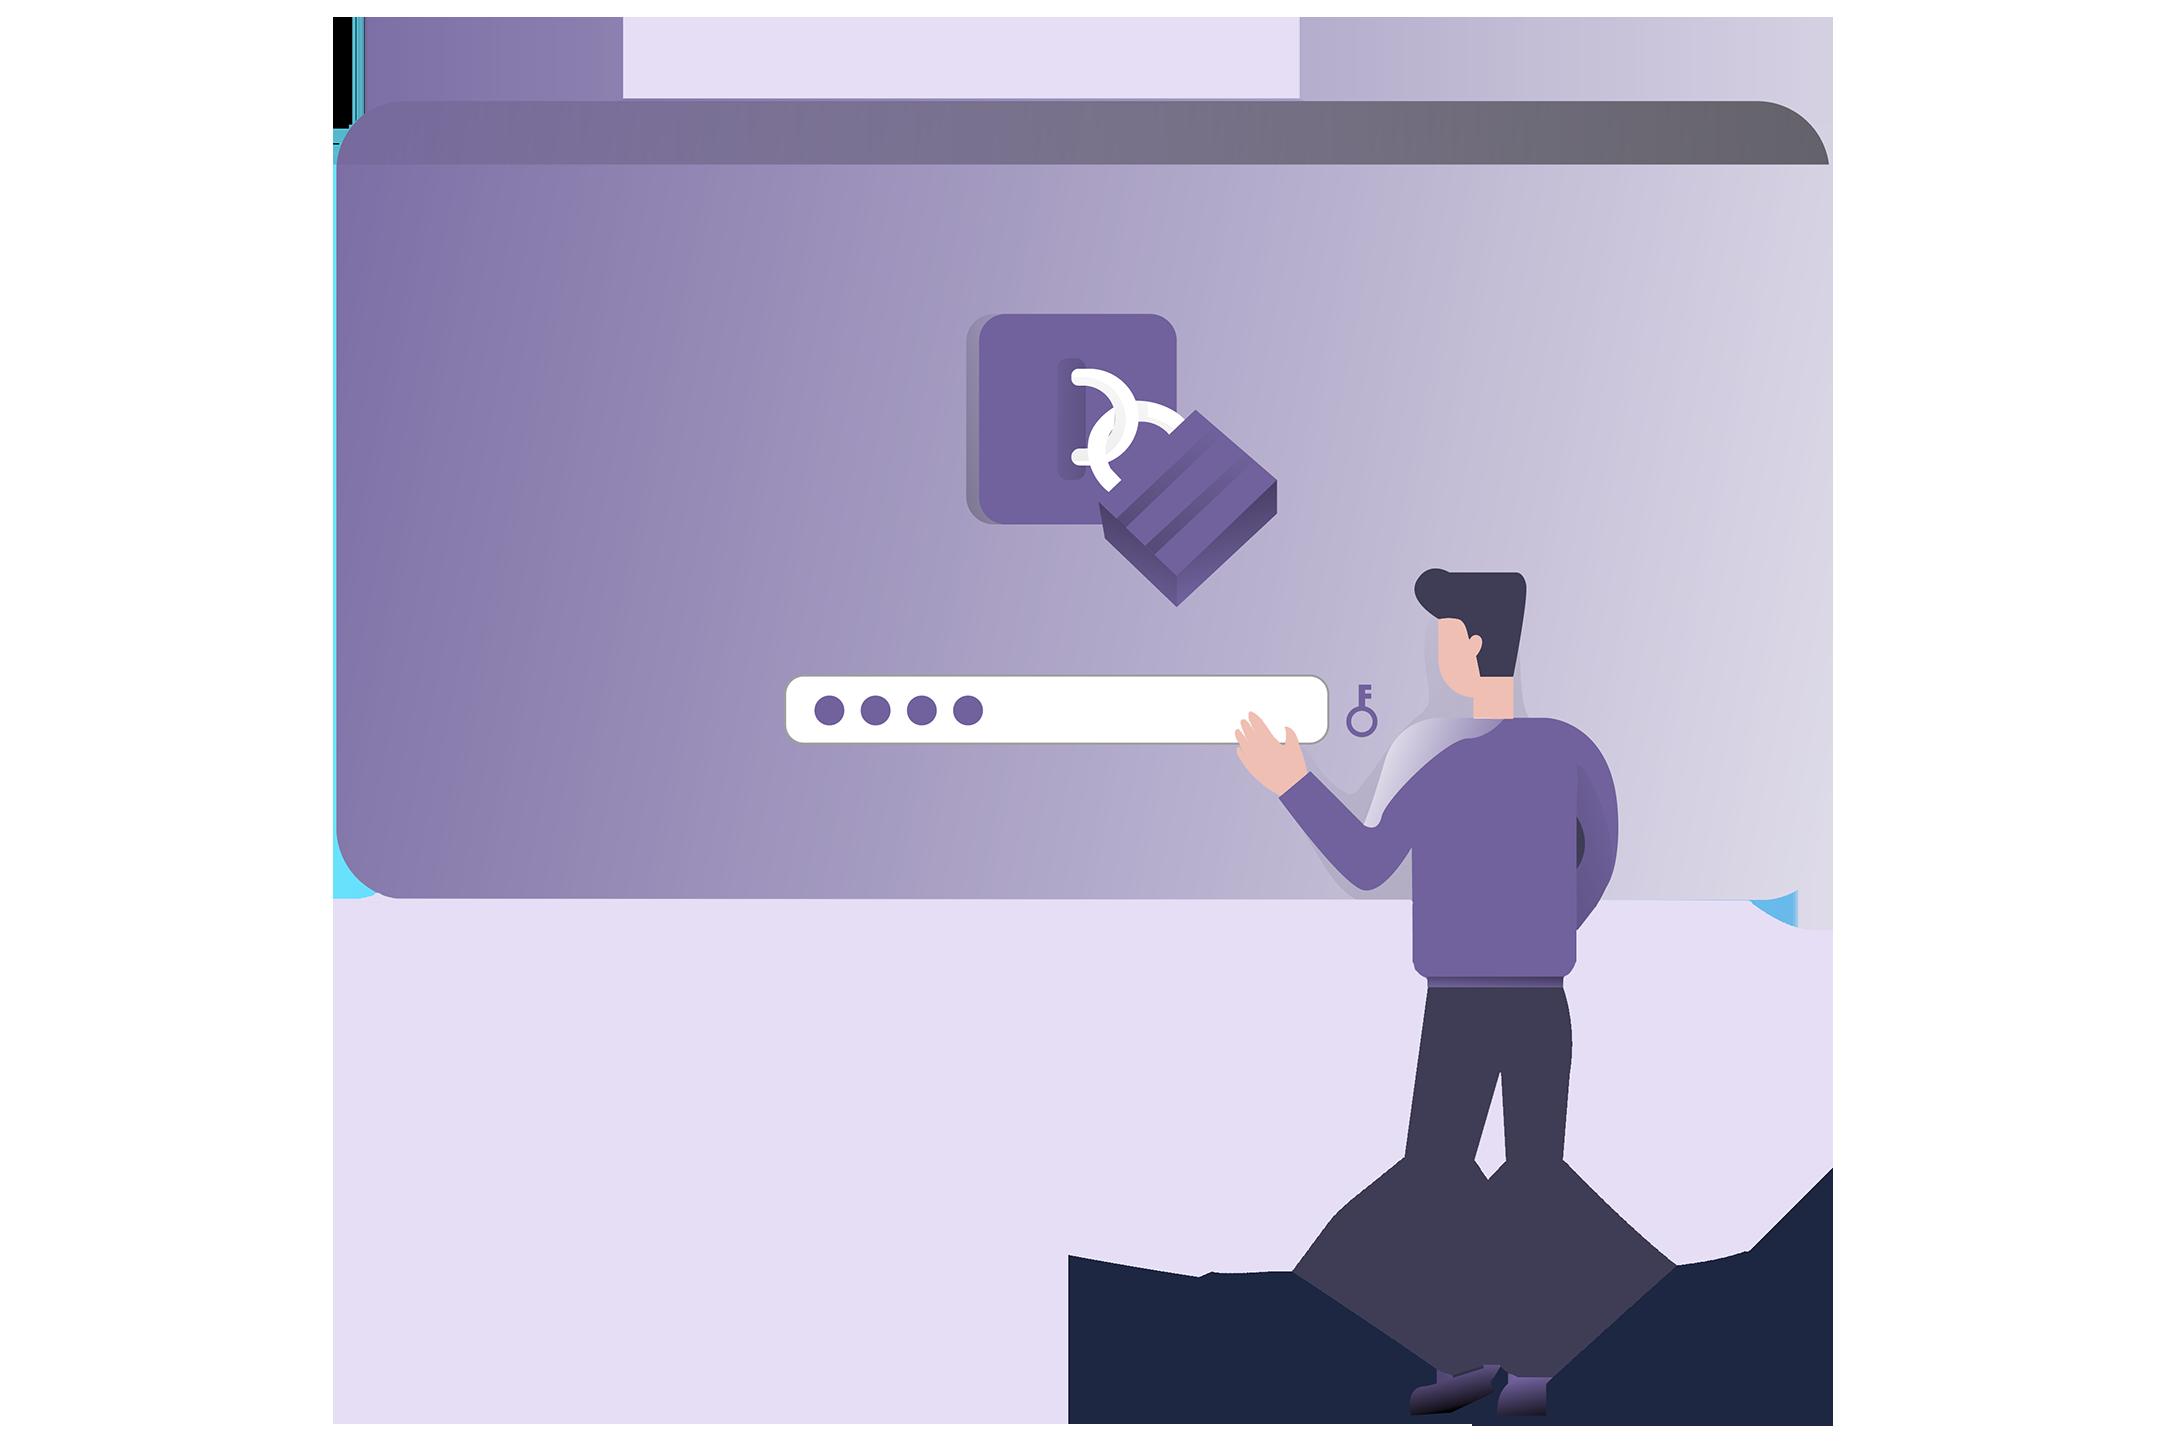 Illustration of platform log in with utmost security